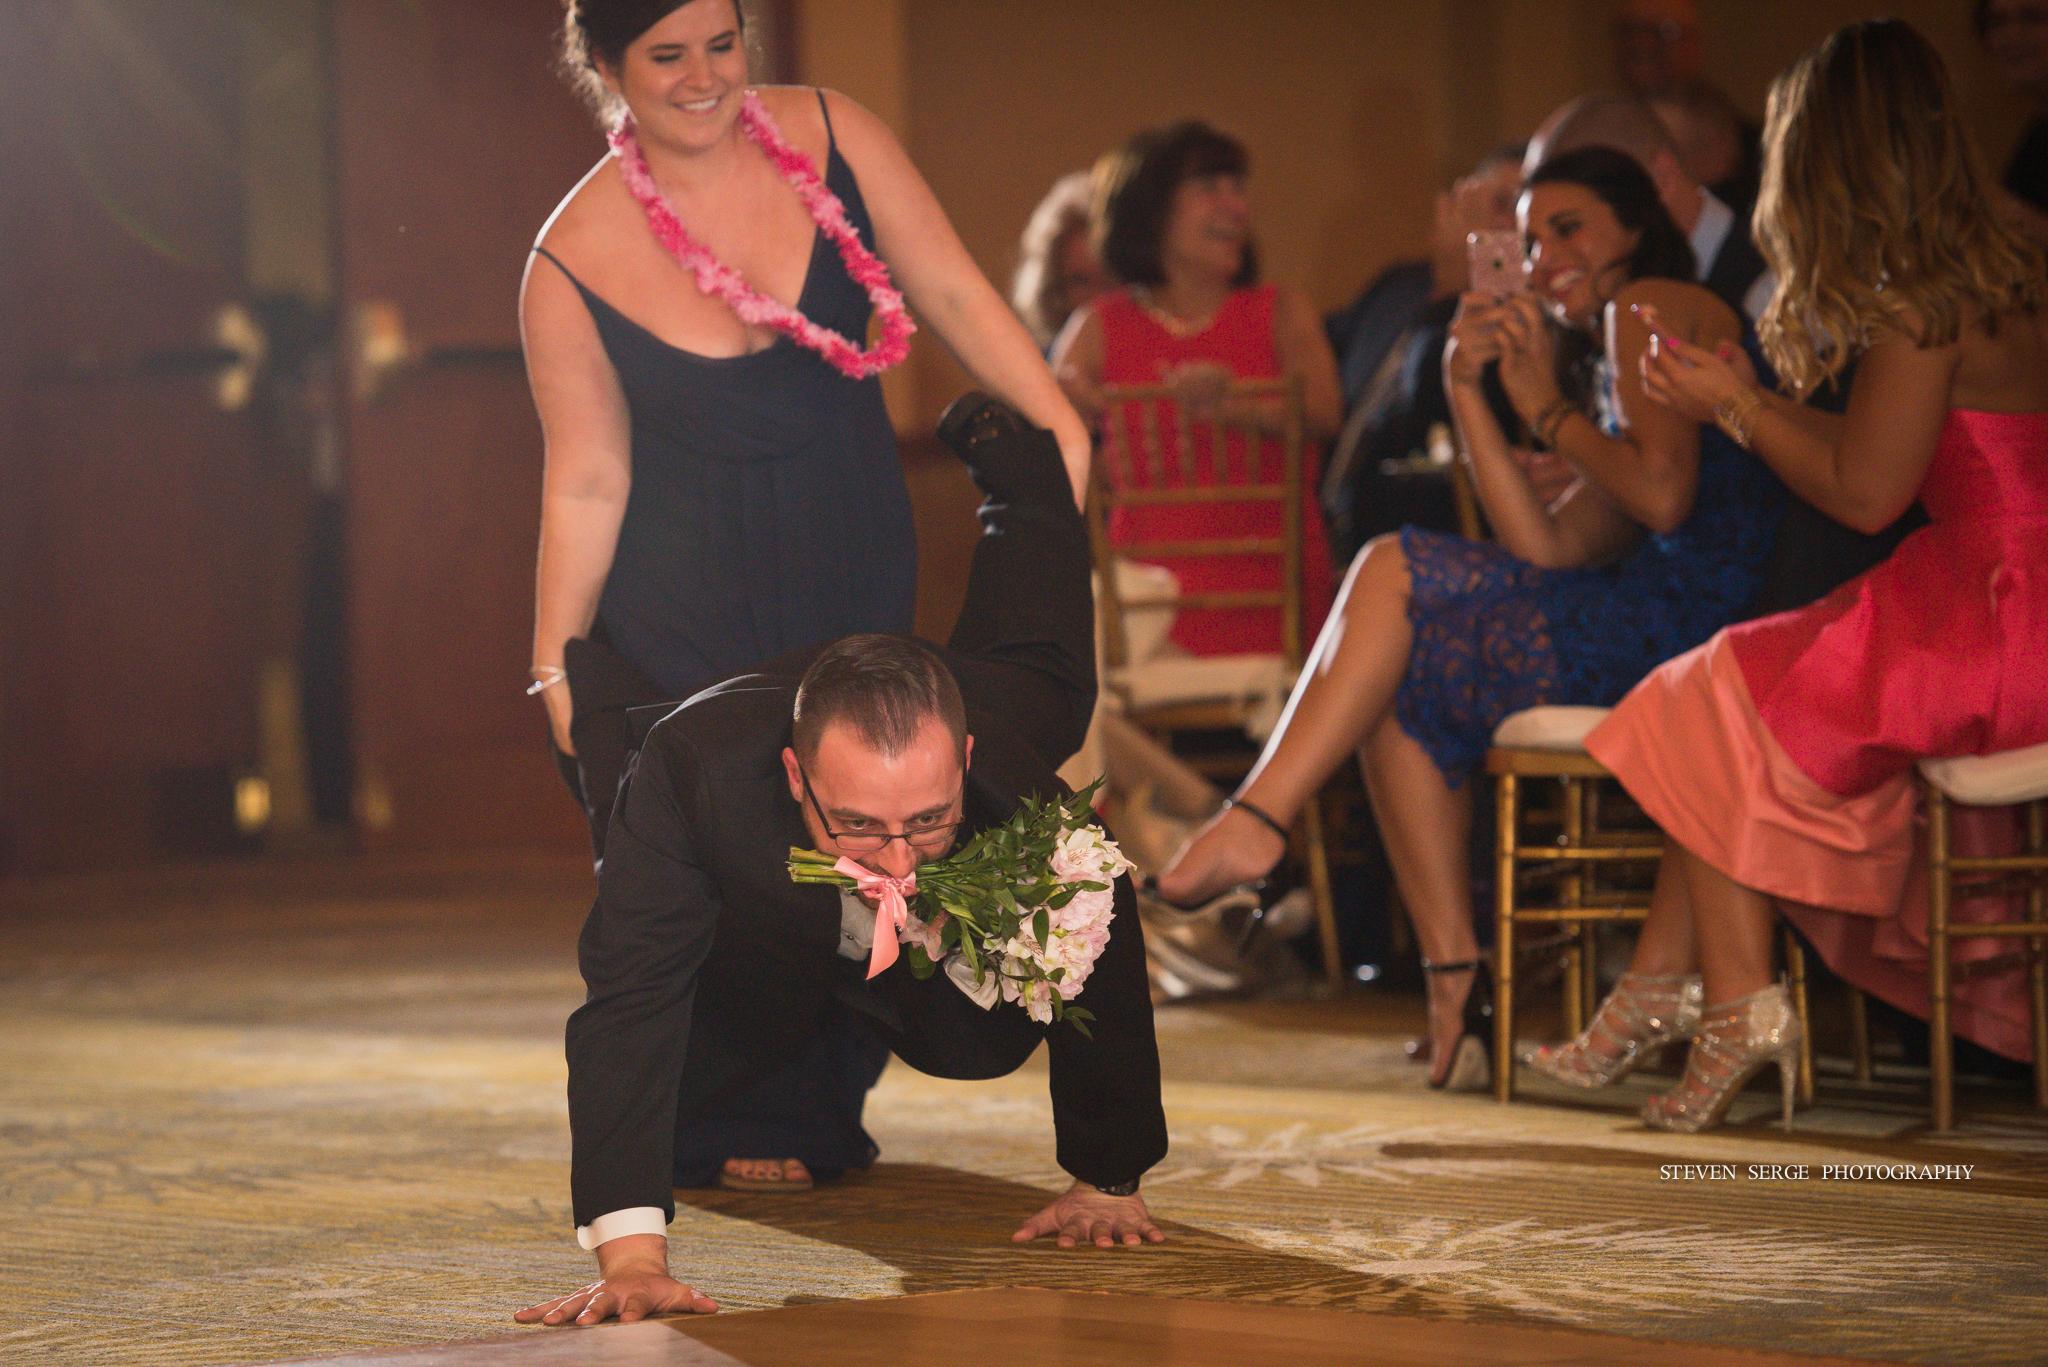 scranton-wedding-photographers-hilton-steven-serge-photography-9.jpg